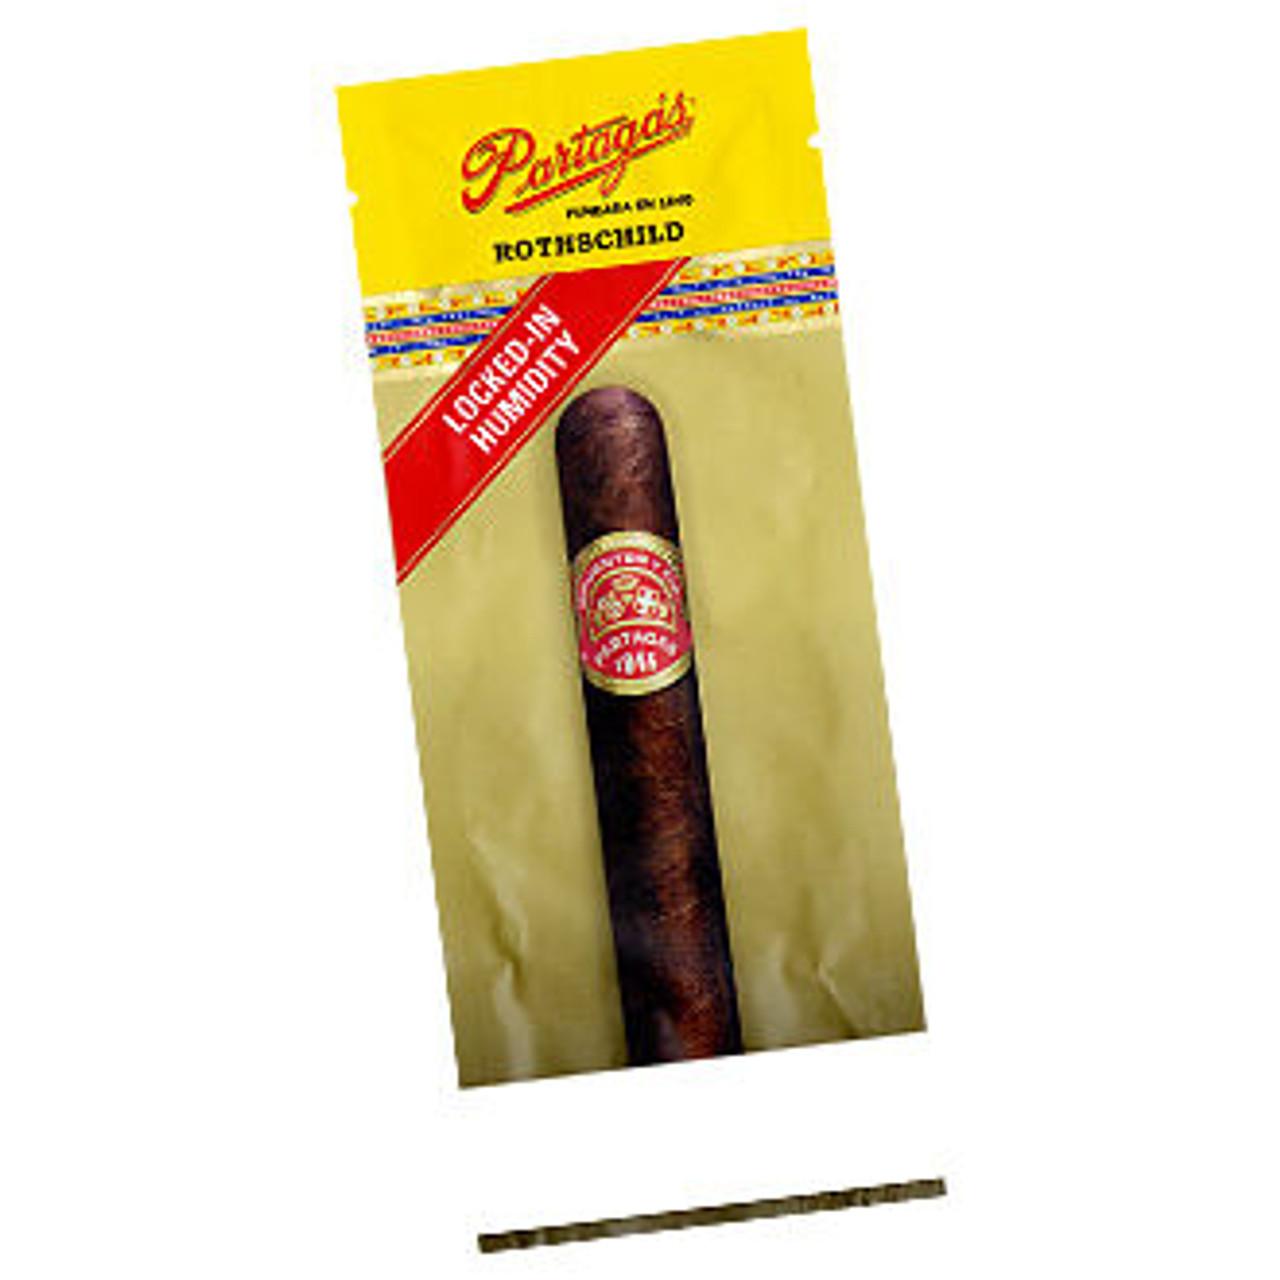 Partagas Robusto Fresh Pack Cigars - 5.5 x 49 (20 Single Fresh Packs in a Display Box)